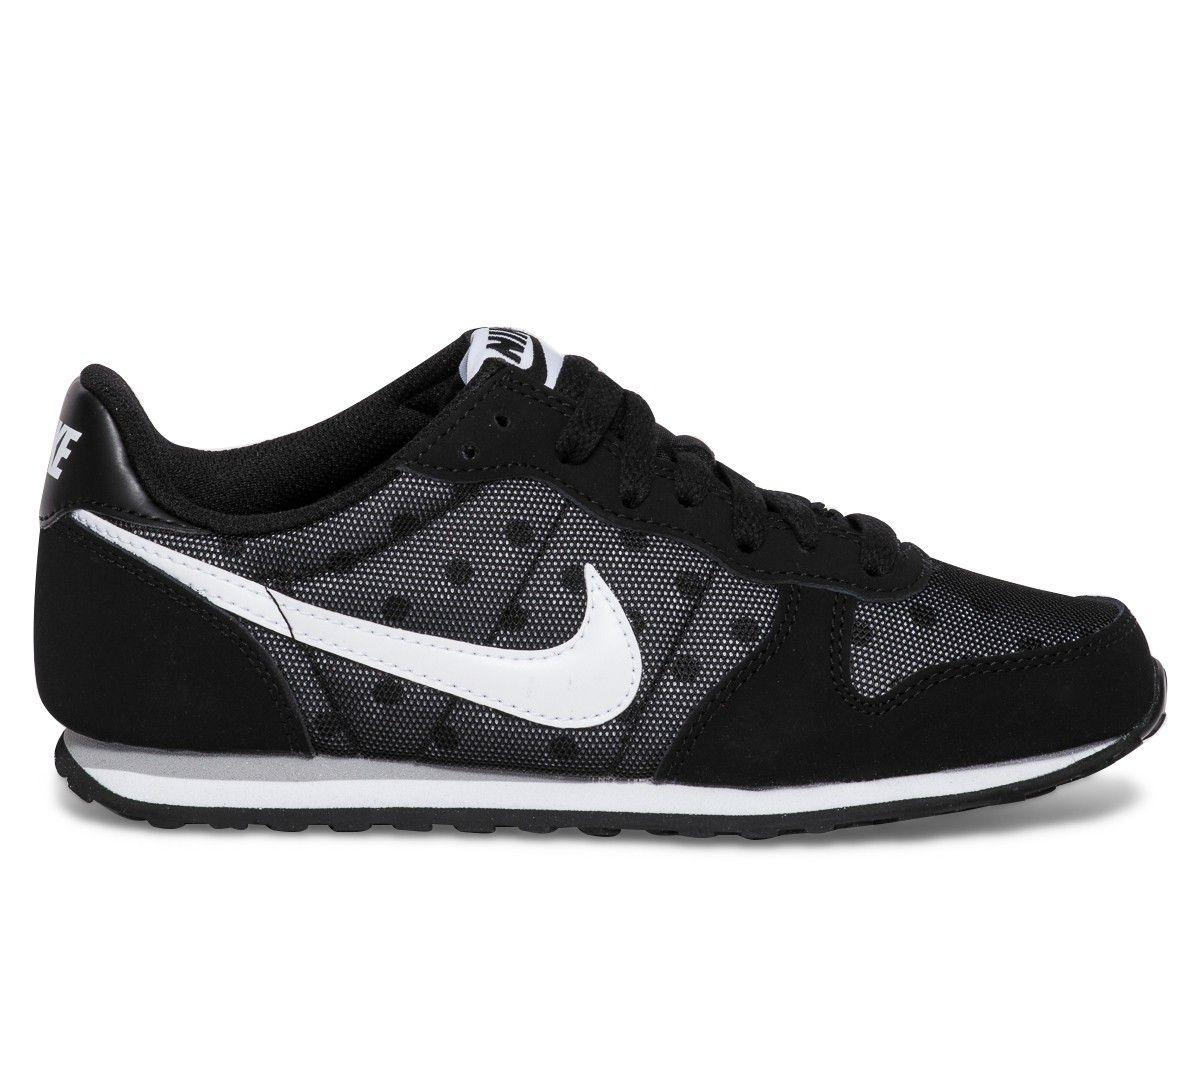 Basket Nike pois noire